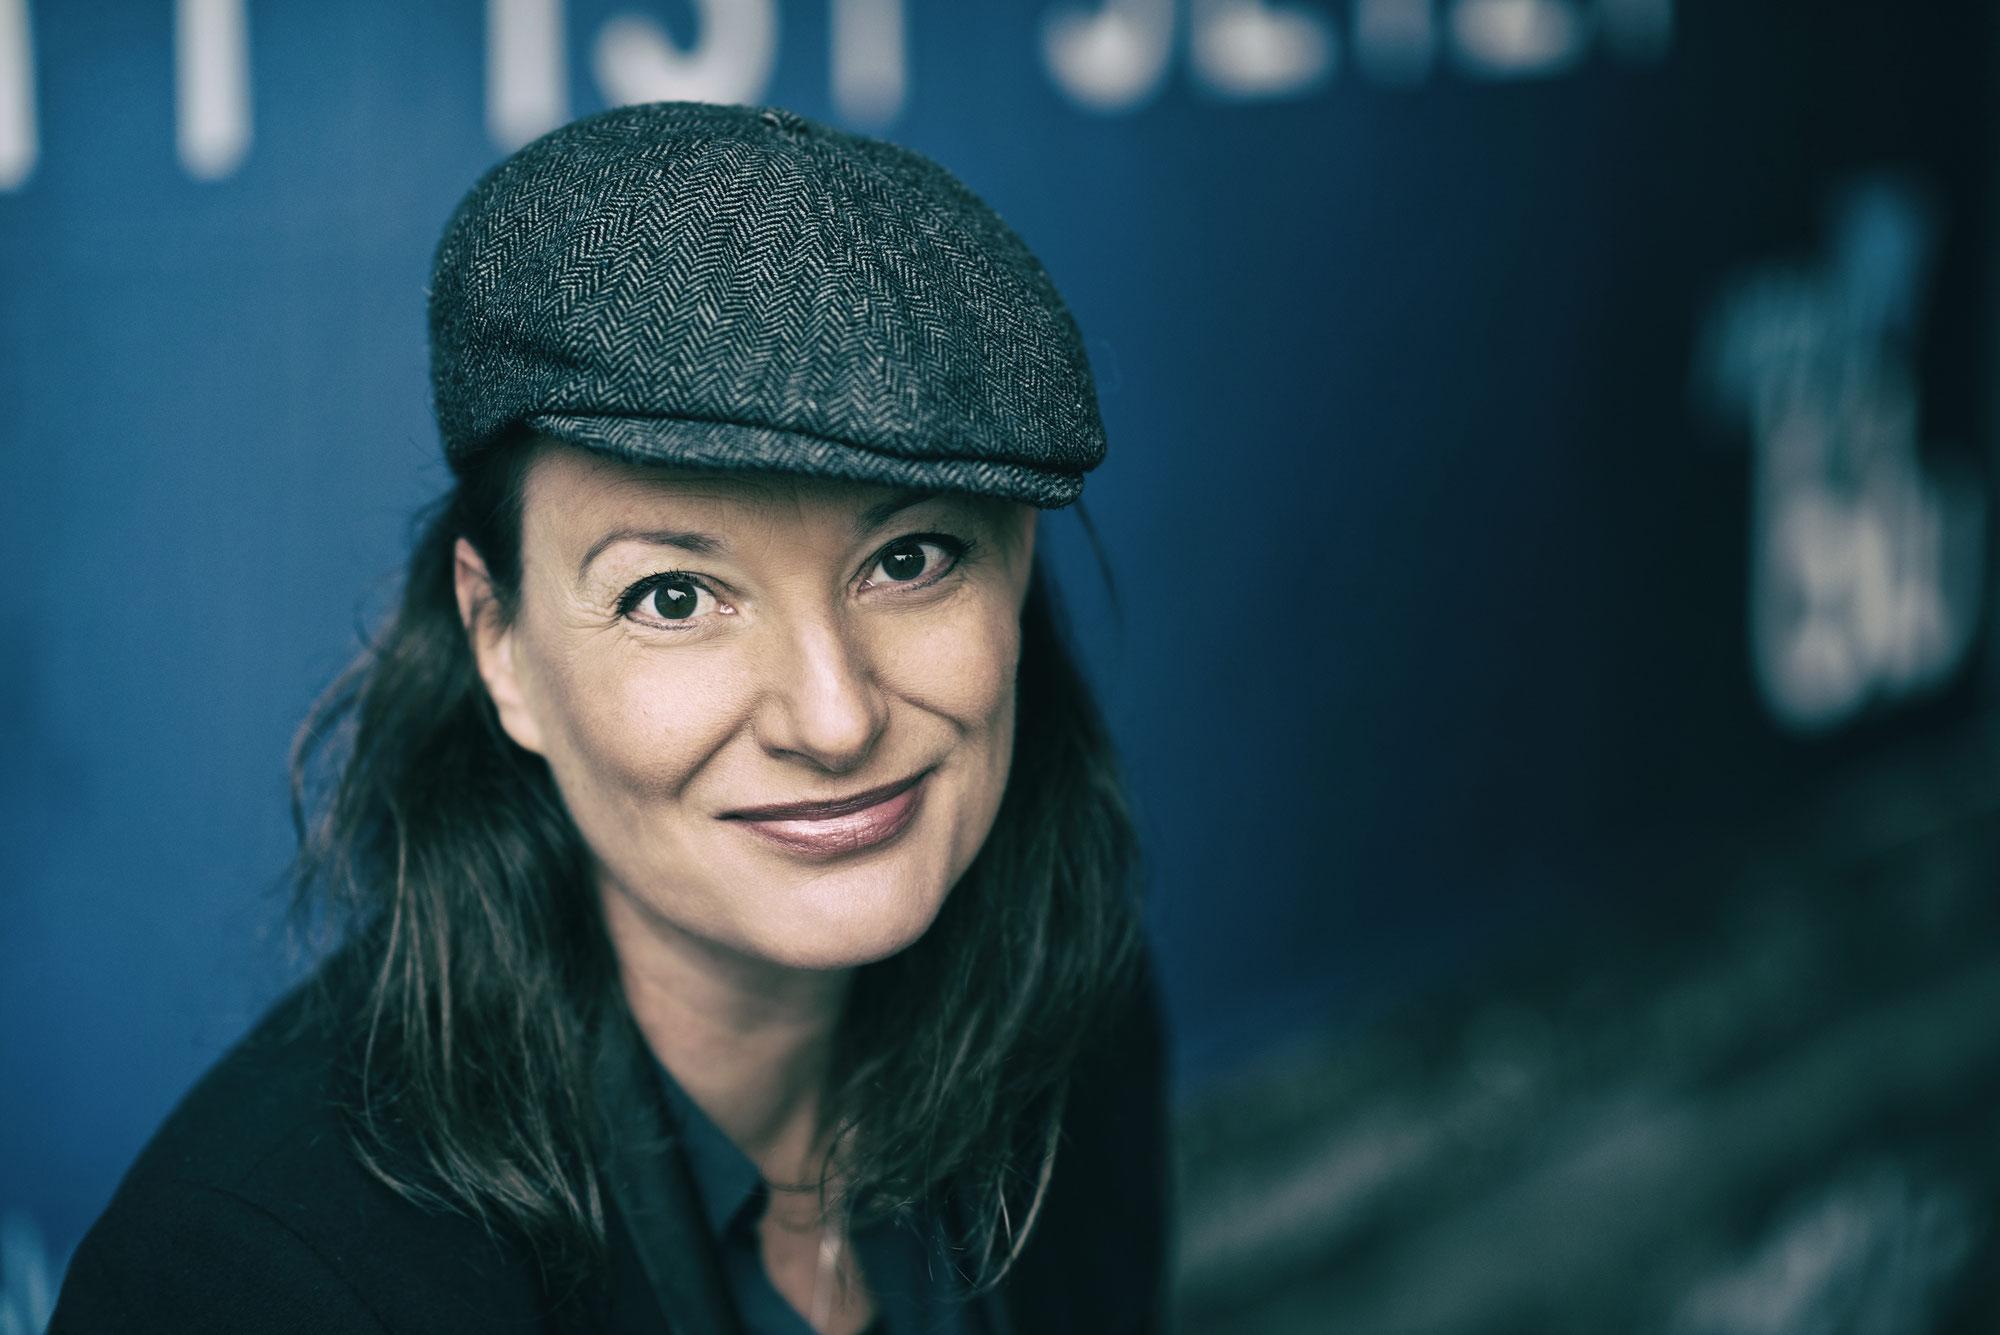 Der Erntehelfer Podcast - Folge 16 - Sonja Kling - selbst ständig kreativ